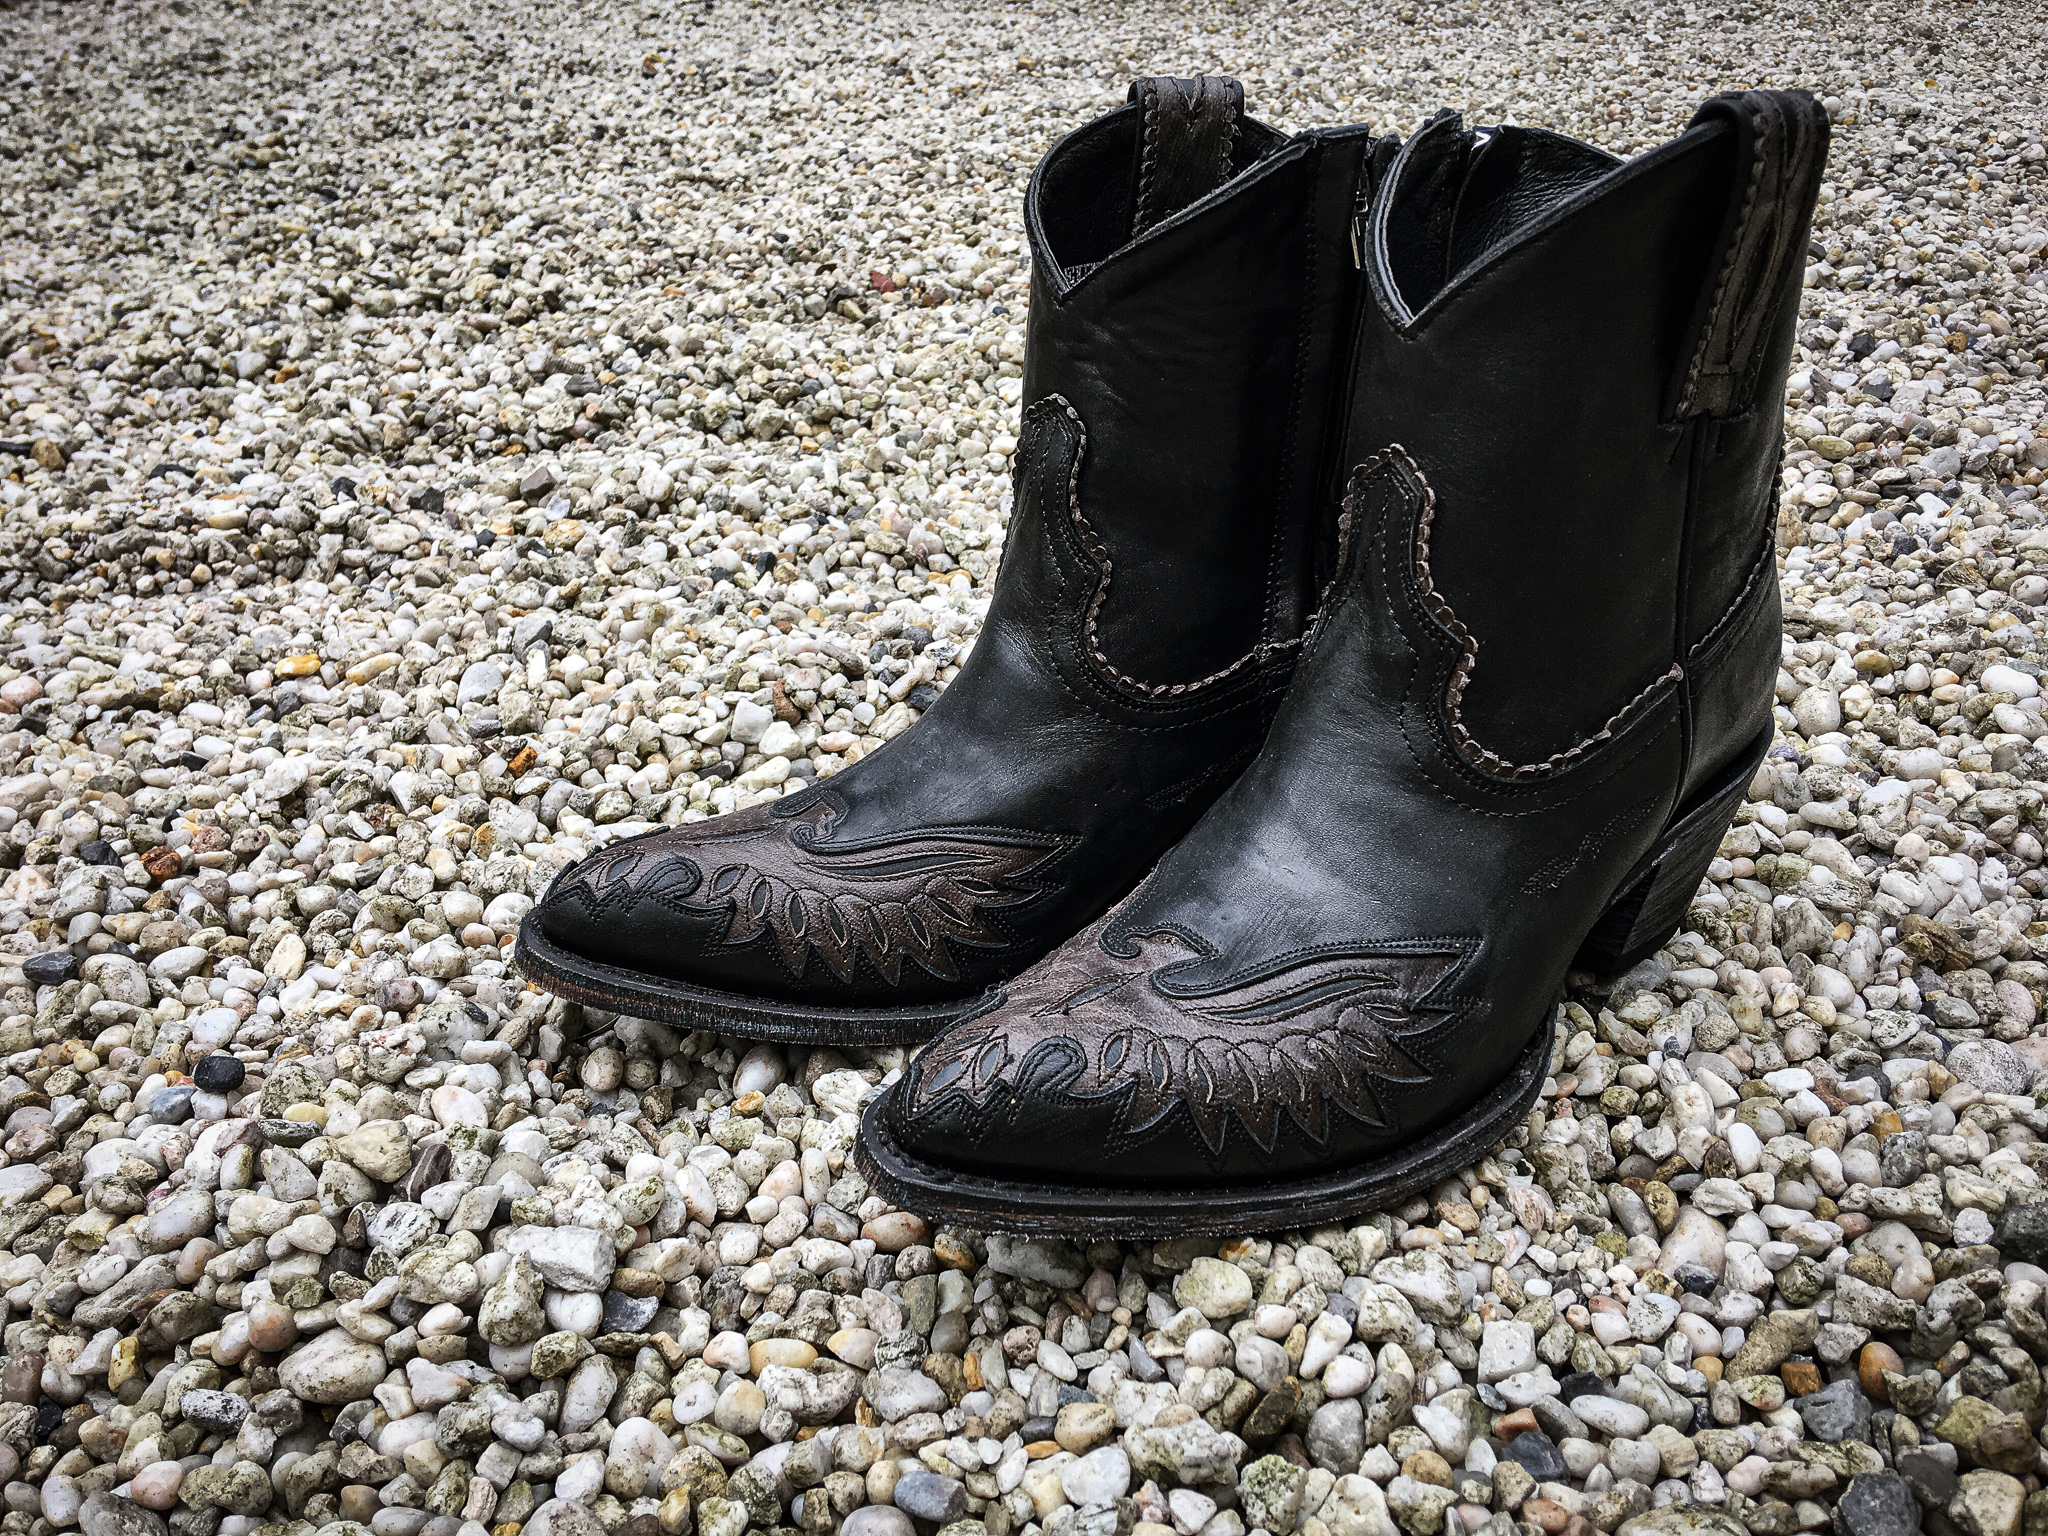 Mexicana Cowboyboots